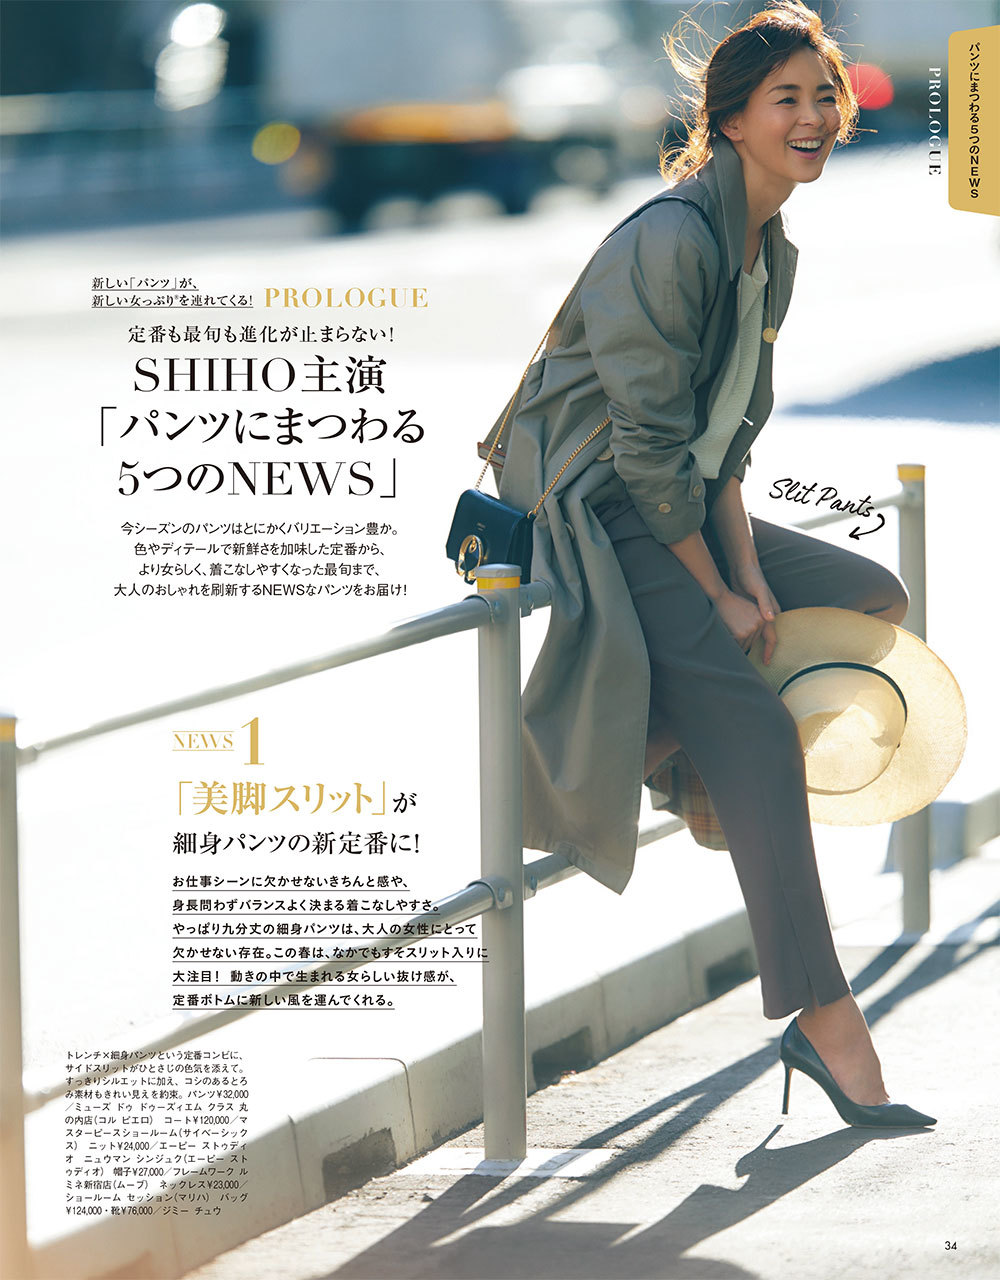 SHIHO主演「パンツにまつわる5つのNEWS」